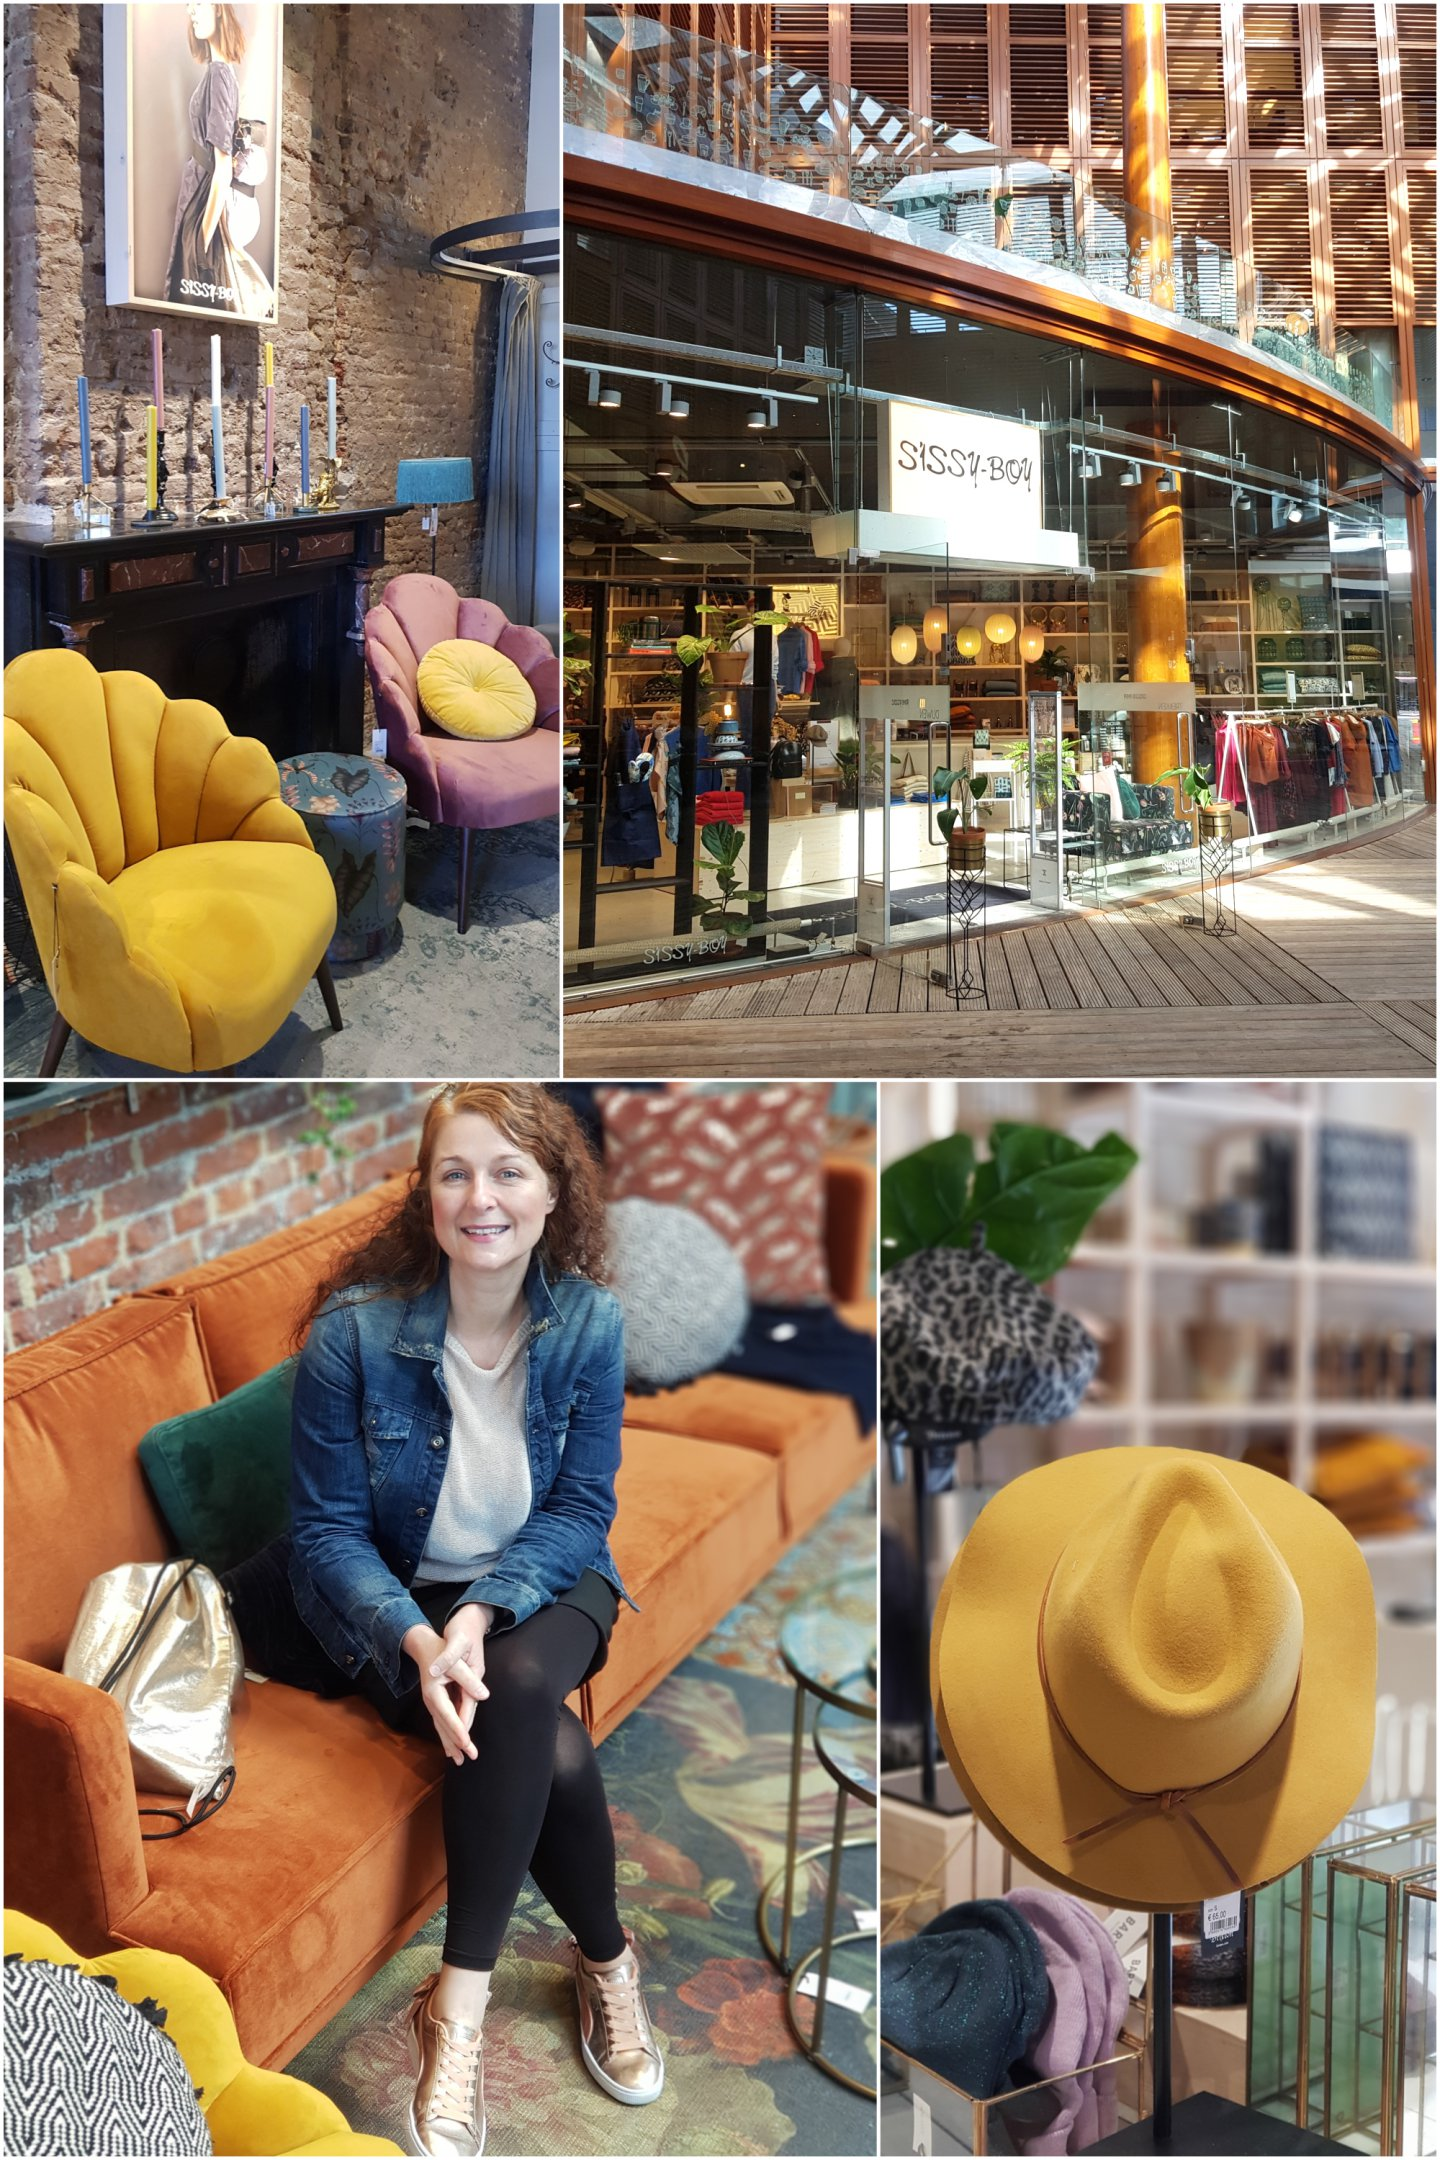 Shopping Sissy Boy Maastricht Tipps